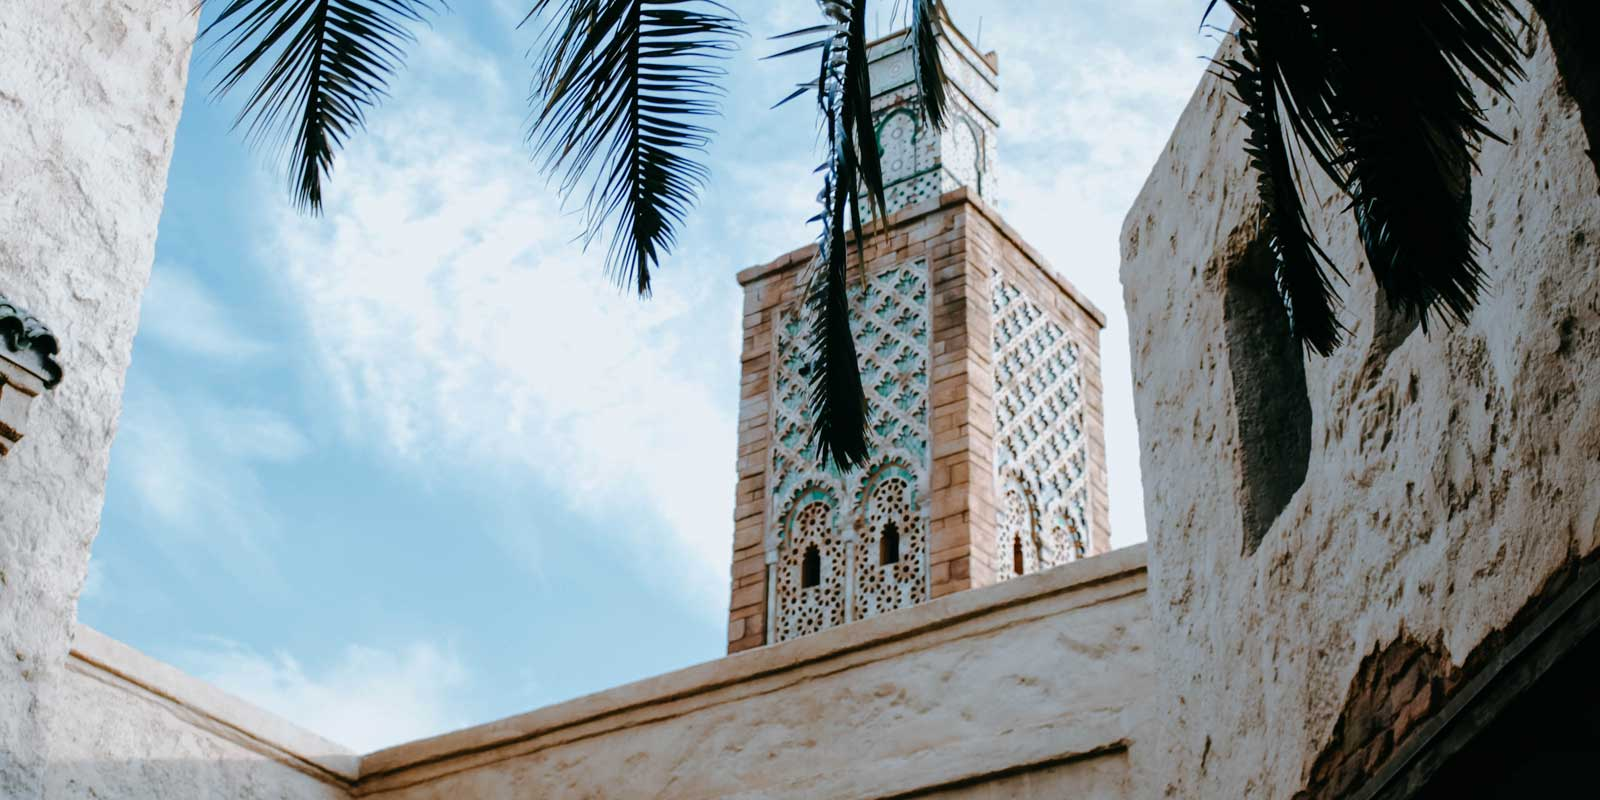 Closeup of a Moroccan building at Epcot's Morocco pavilion in Epcot's World Showcase.